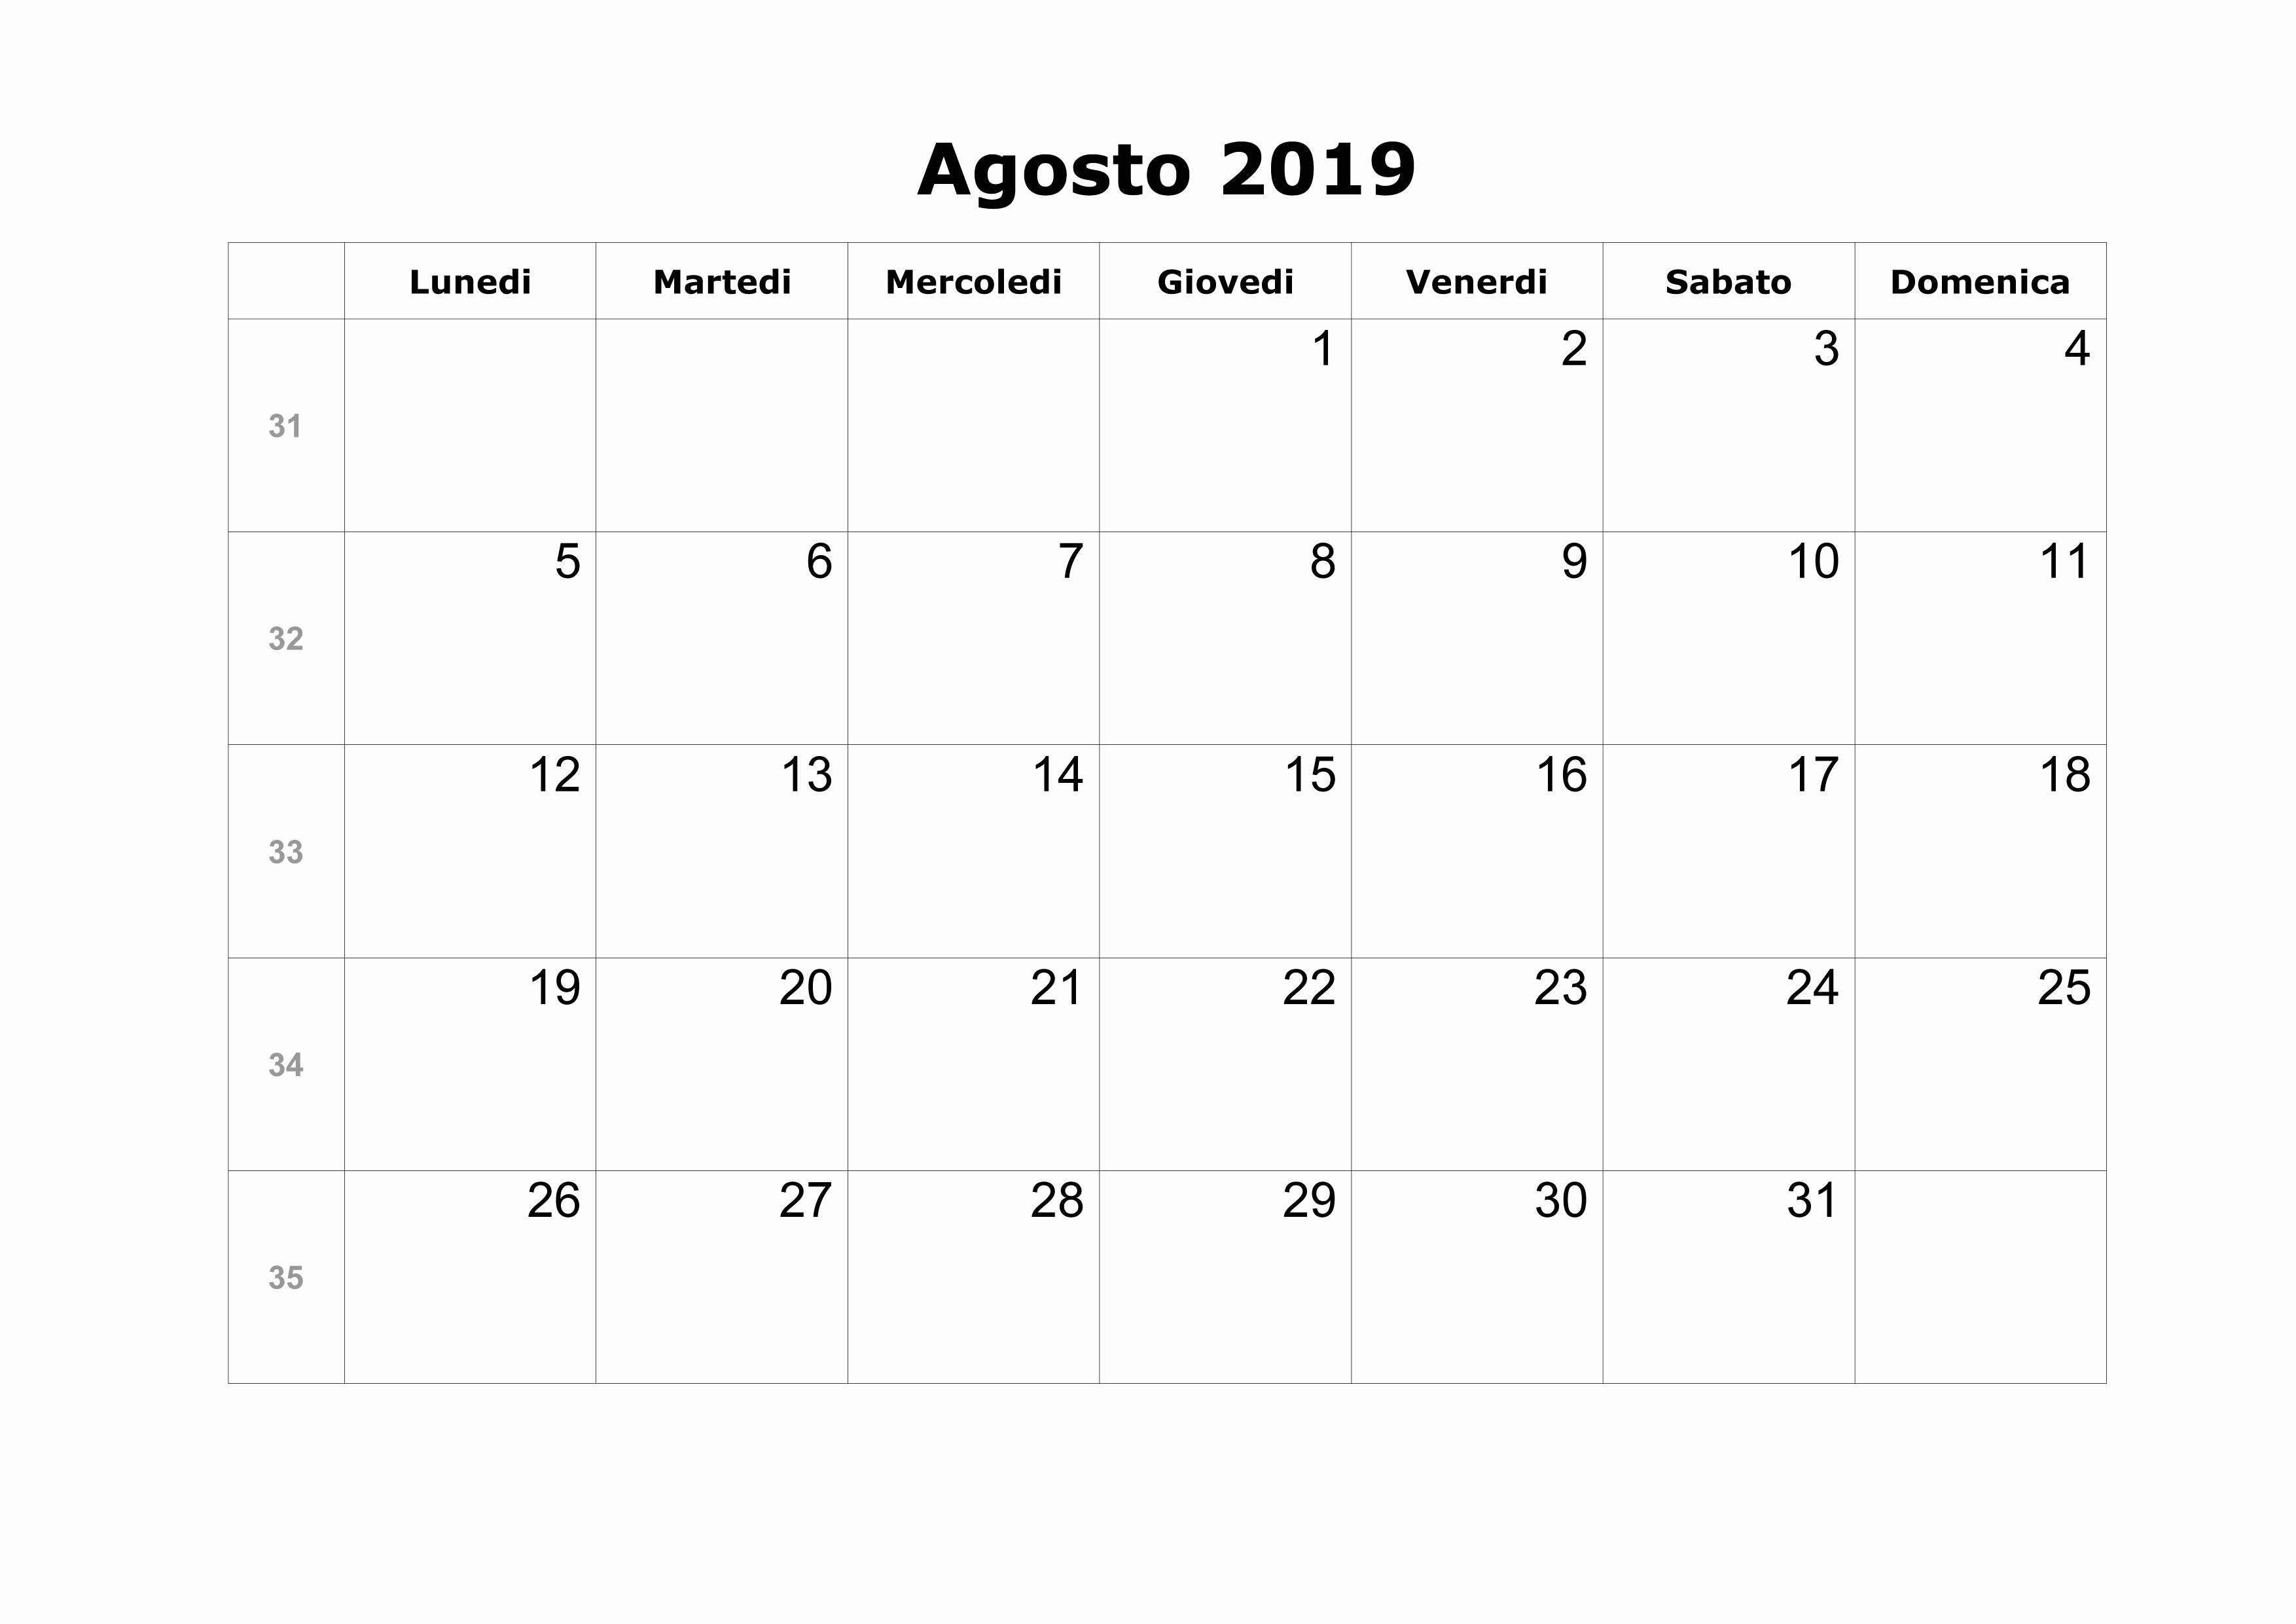 Calendario Para Imprimir 2019 Con Fotos Recientes Inspiraci³n 40 Ejemplo Agisto 2019 Of Calendario Para Imprimir 2019 Con Fotos Más Reciente Observar Calendario Para Imprimir 2019 Pdf